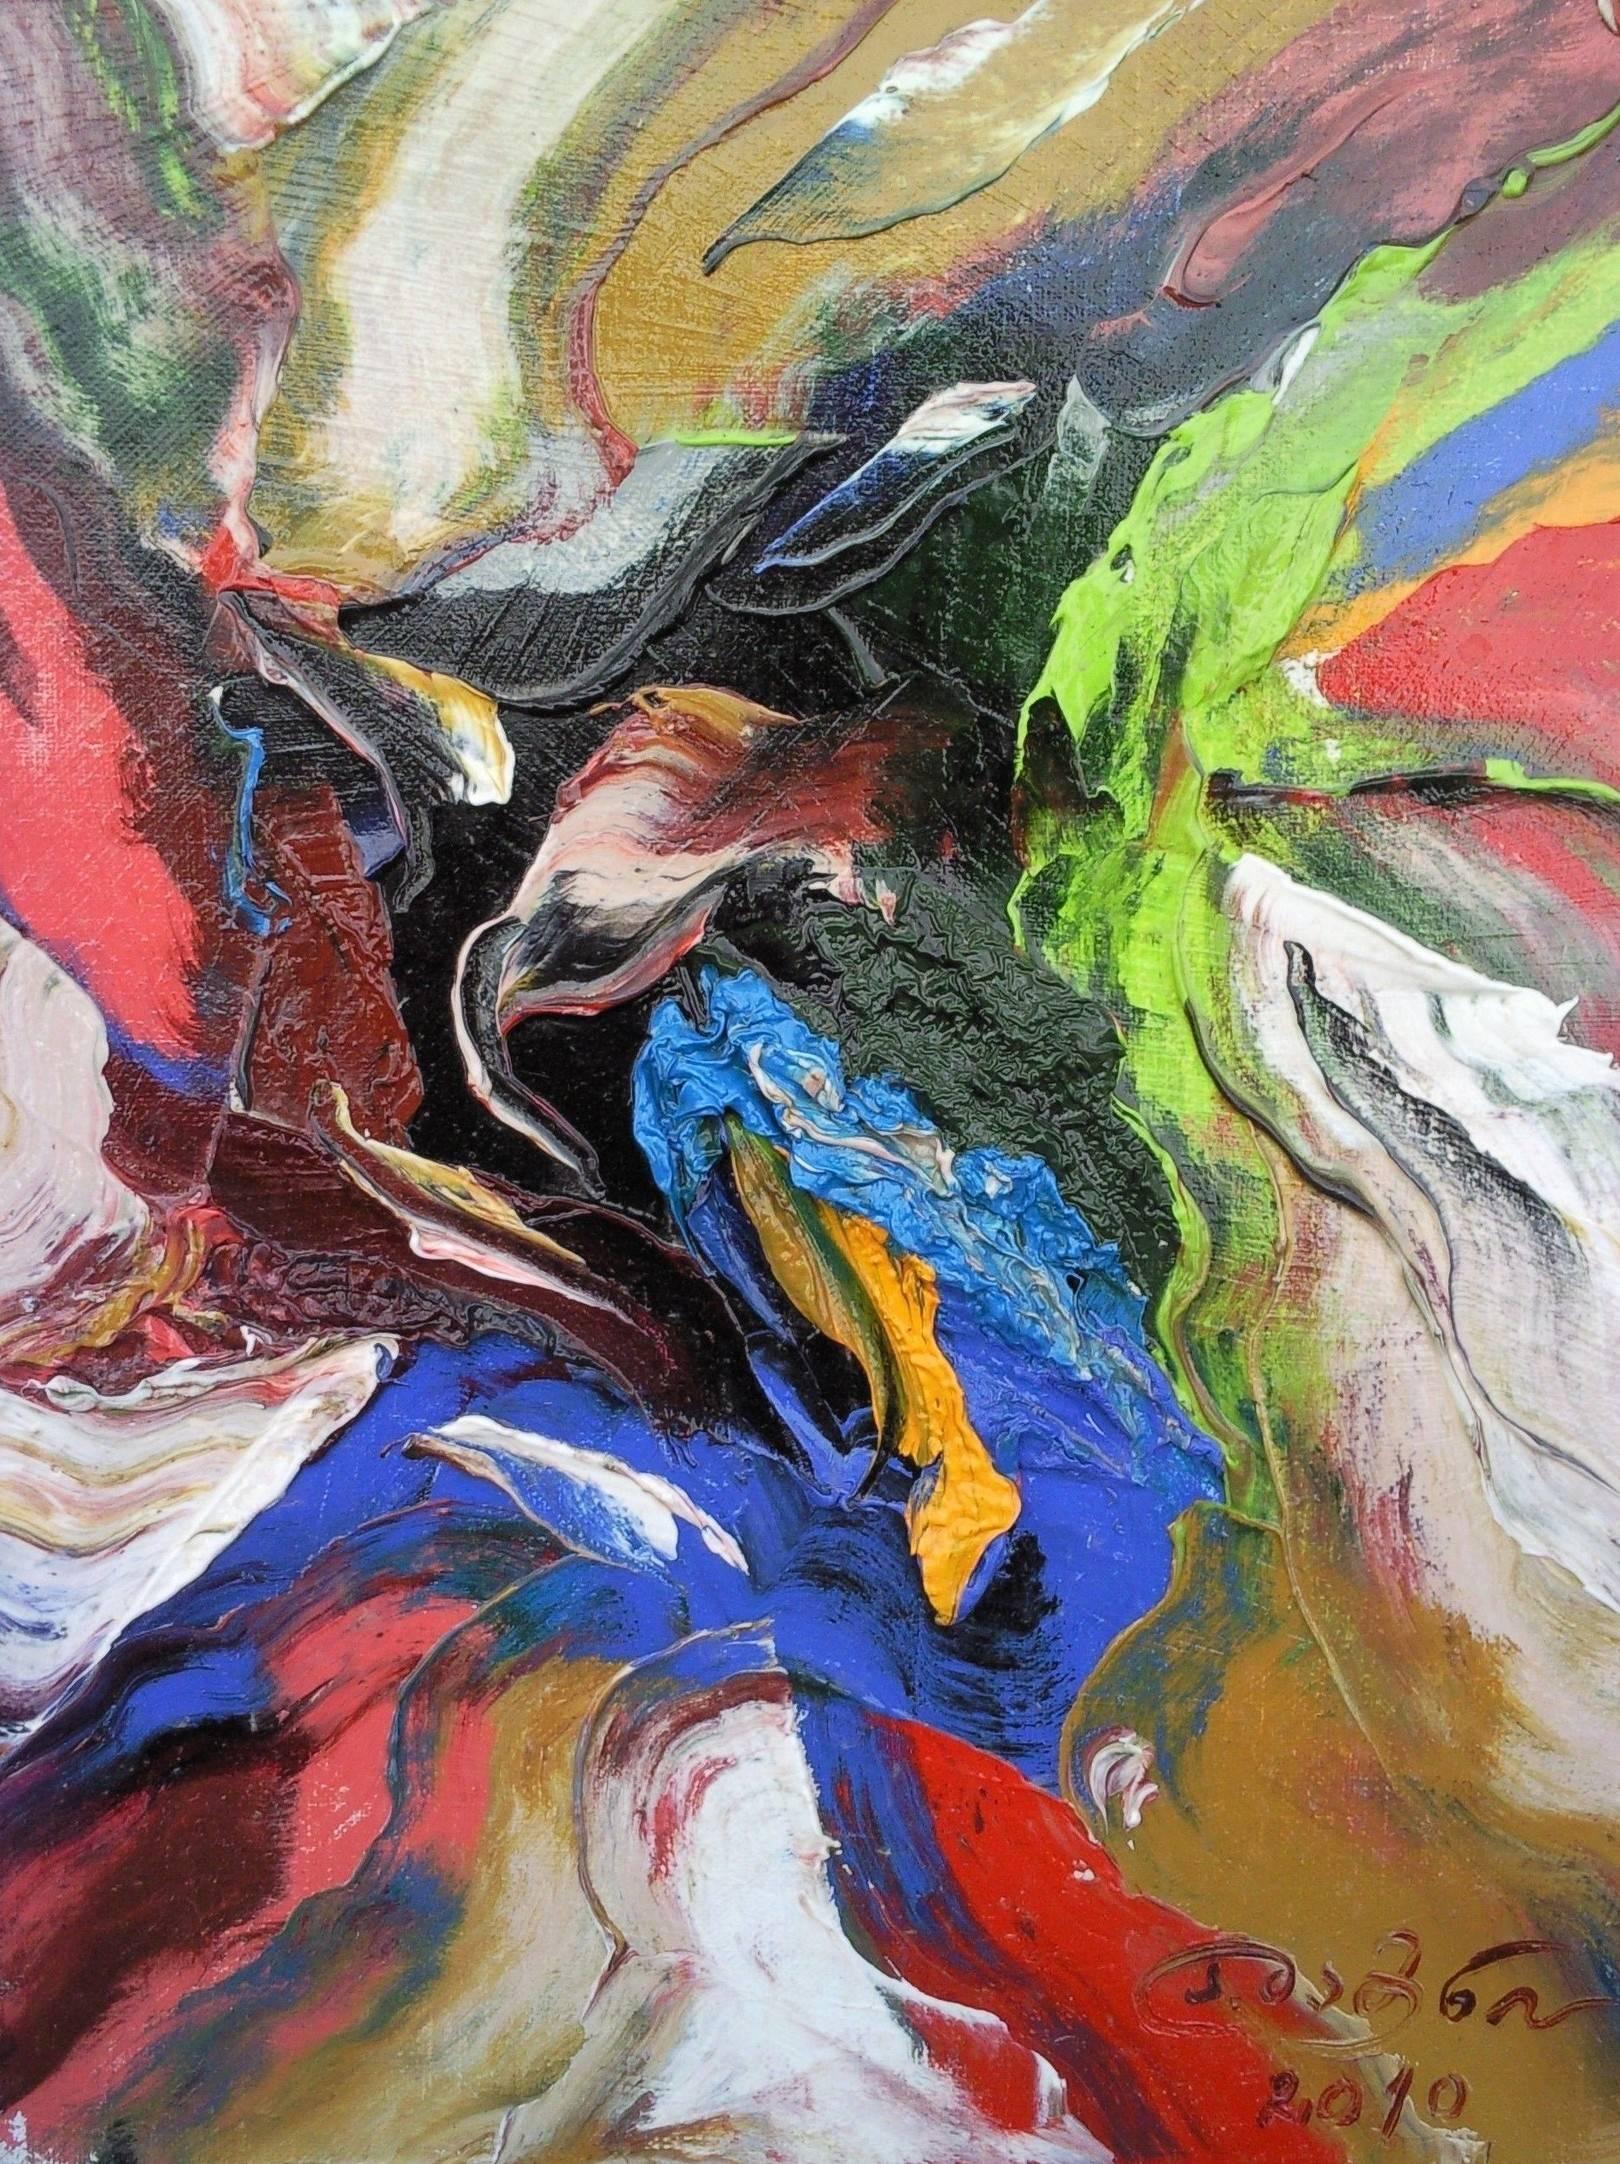 «Русалка на берегу моря»                  холст, масло «The mermaid on the seashore»          oil on canvas                                                  30x24,  2010